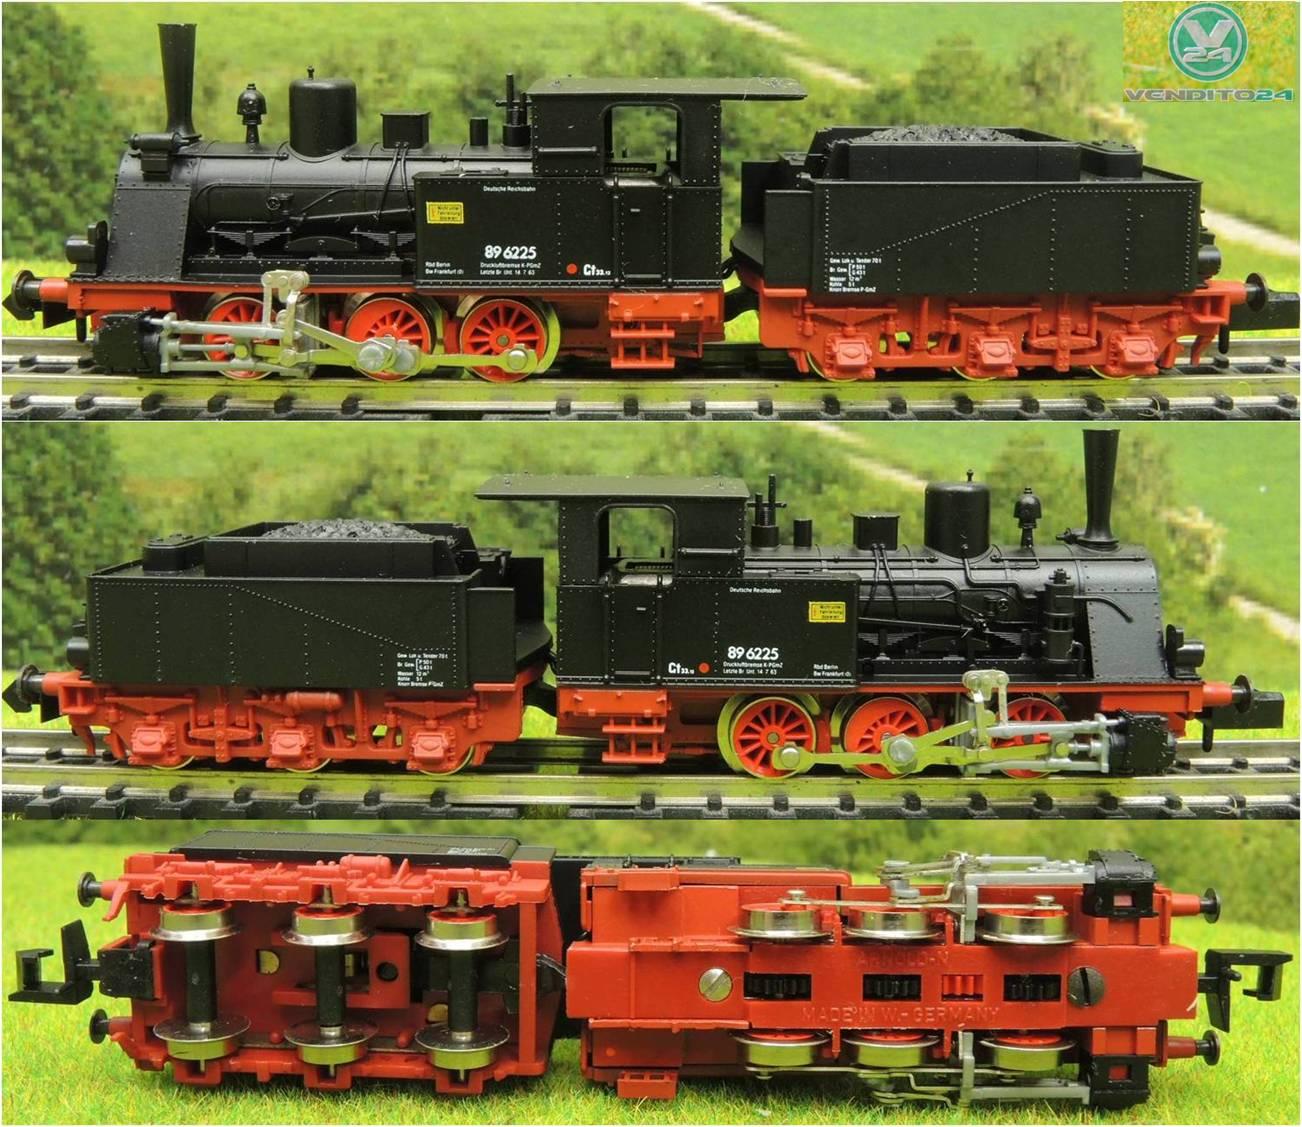 Arnold Modellbahn Katalog Pdf